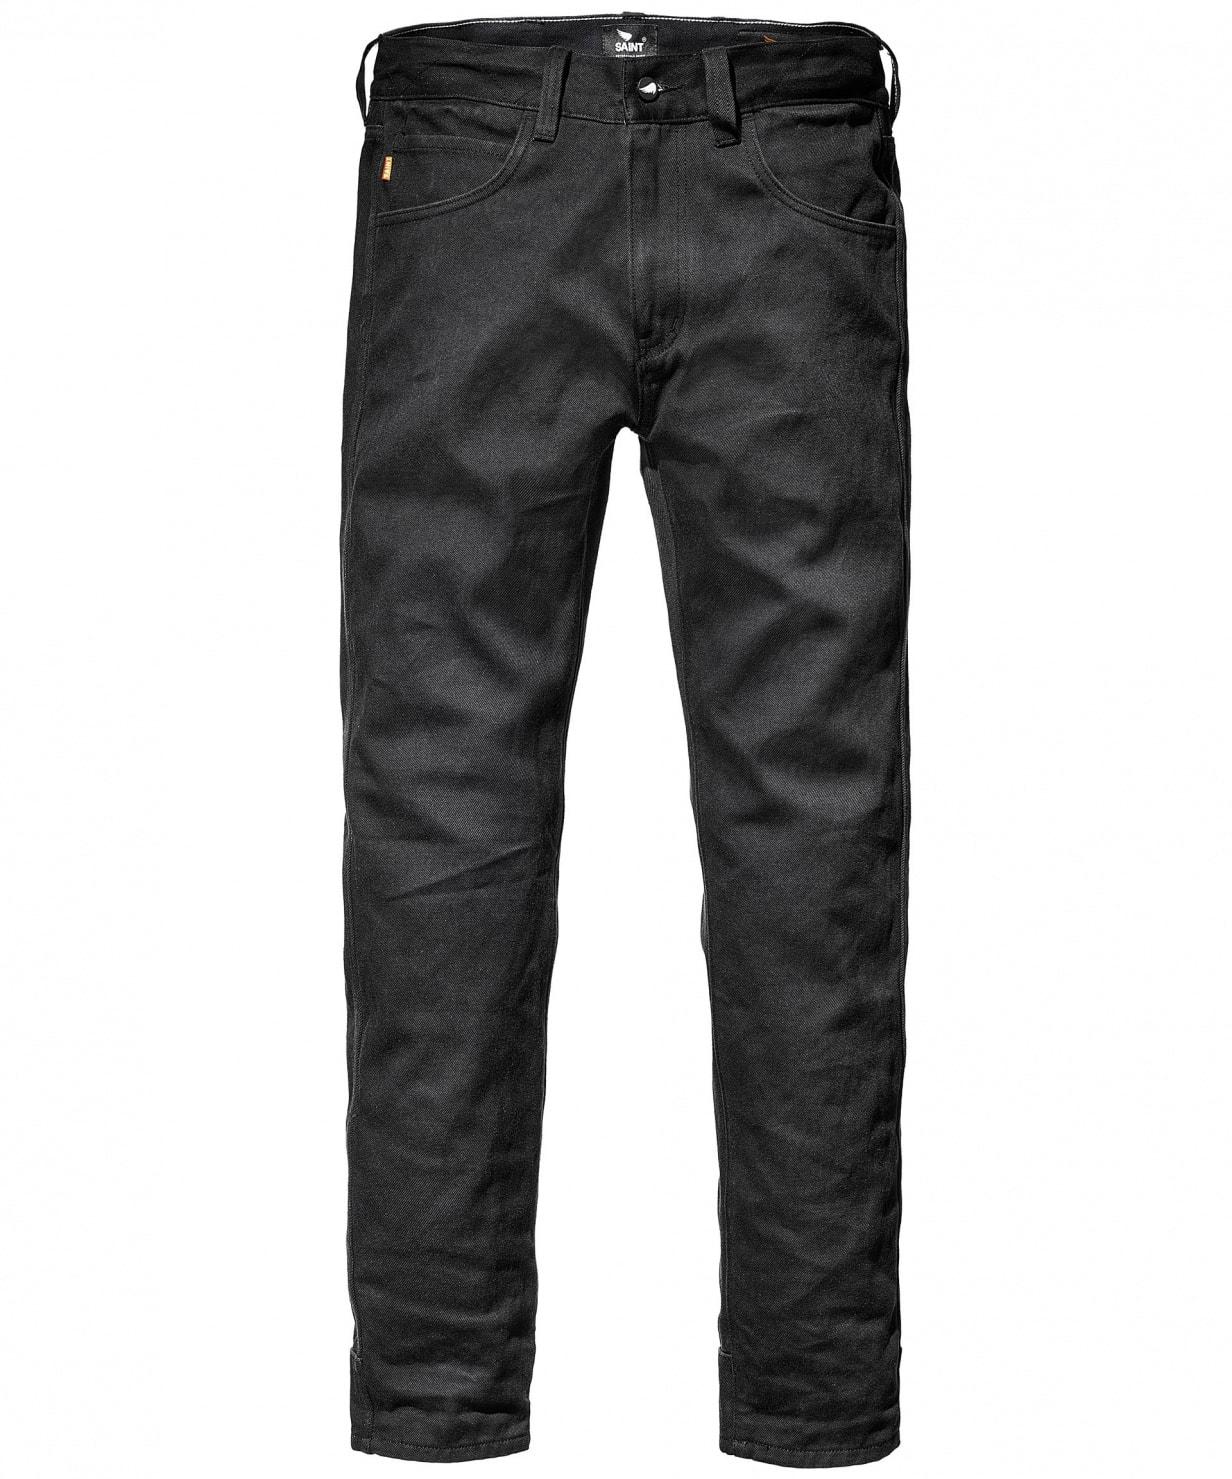 saint unbreakable jeans indigo front